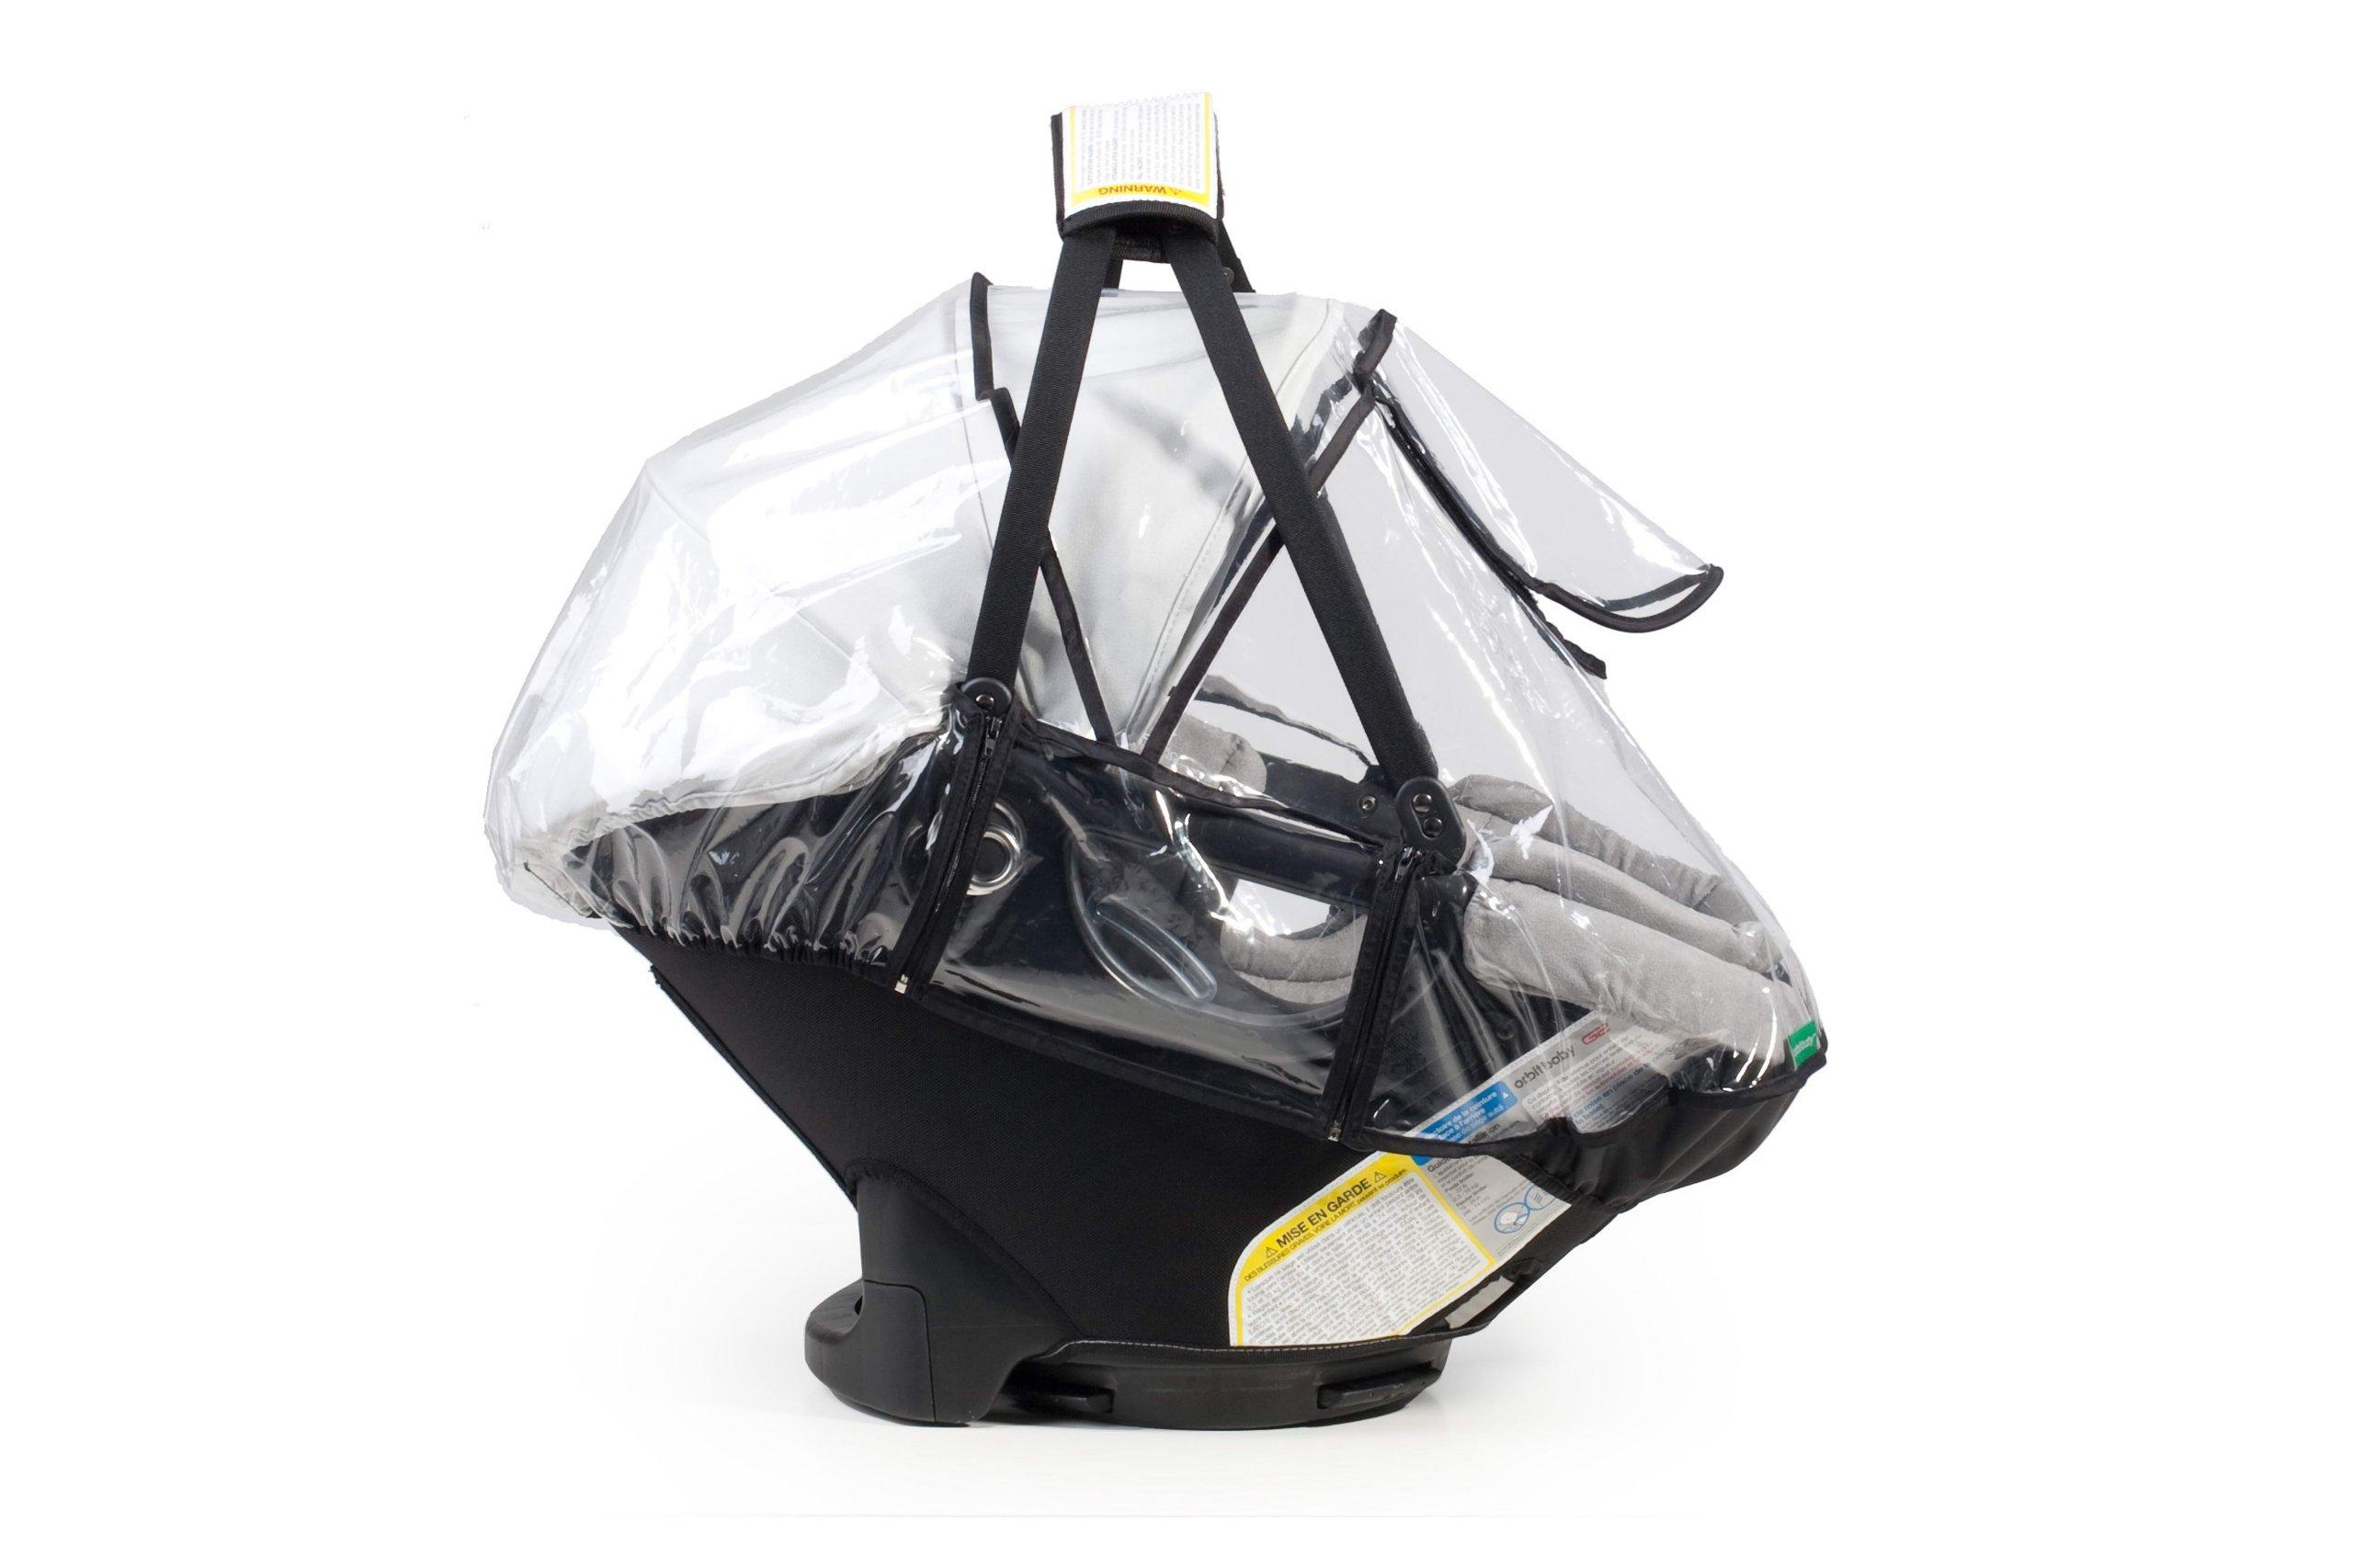 Amazon.com : Orbit Baby Sidekick Stroller Board for ...